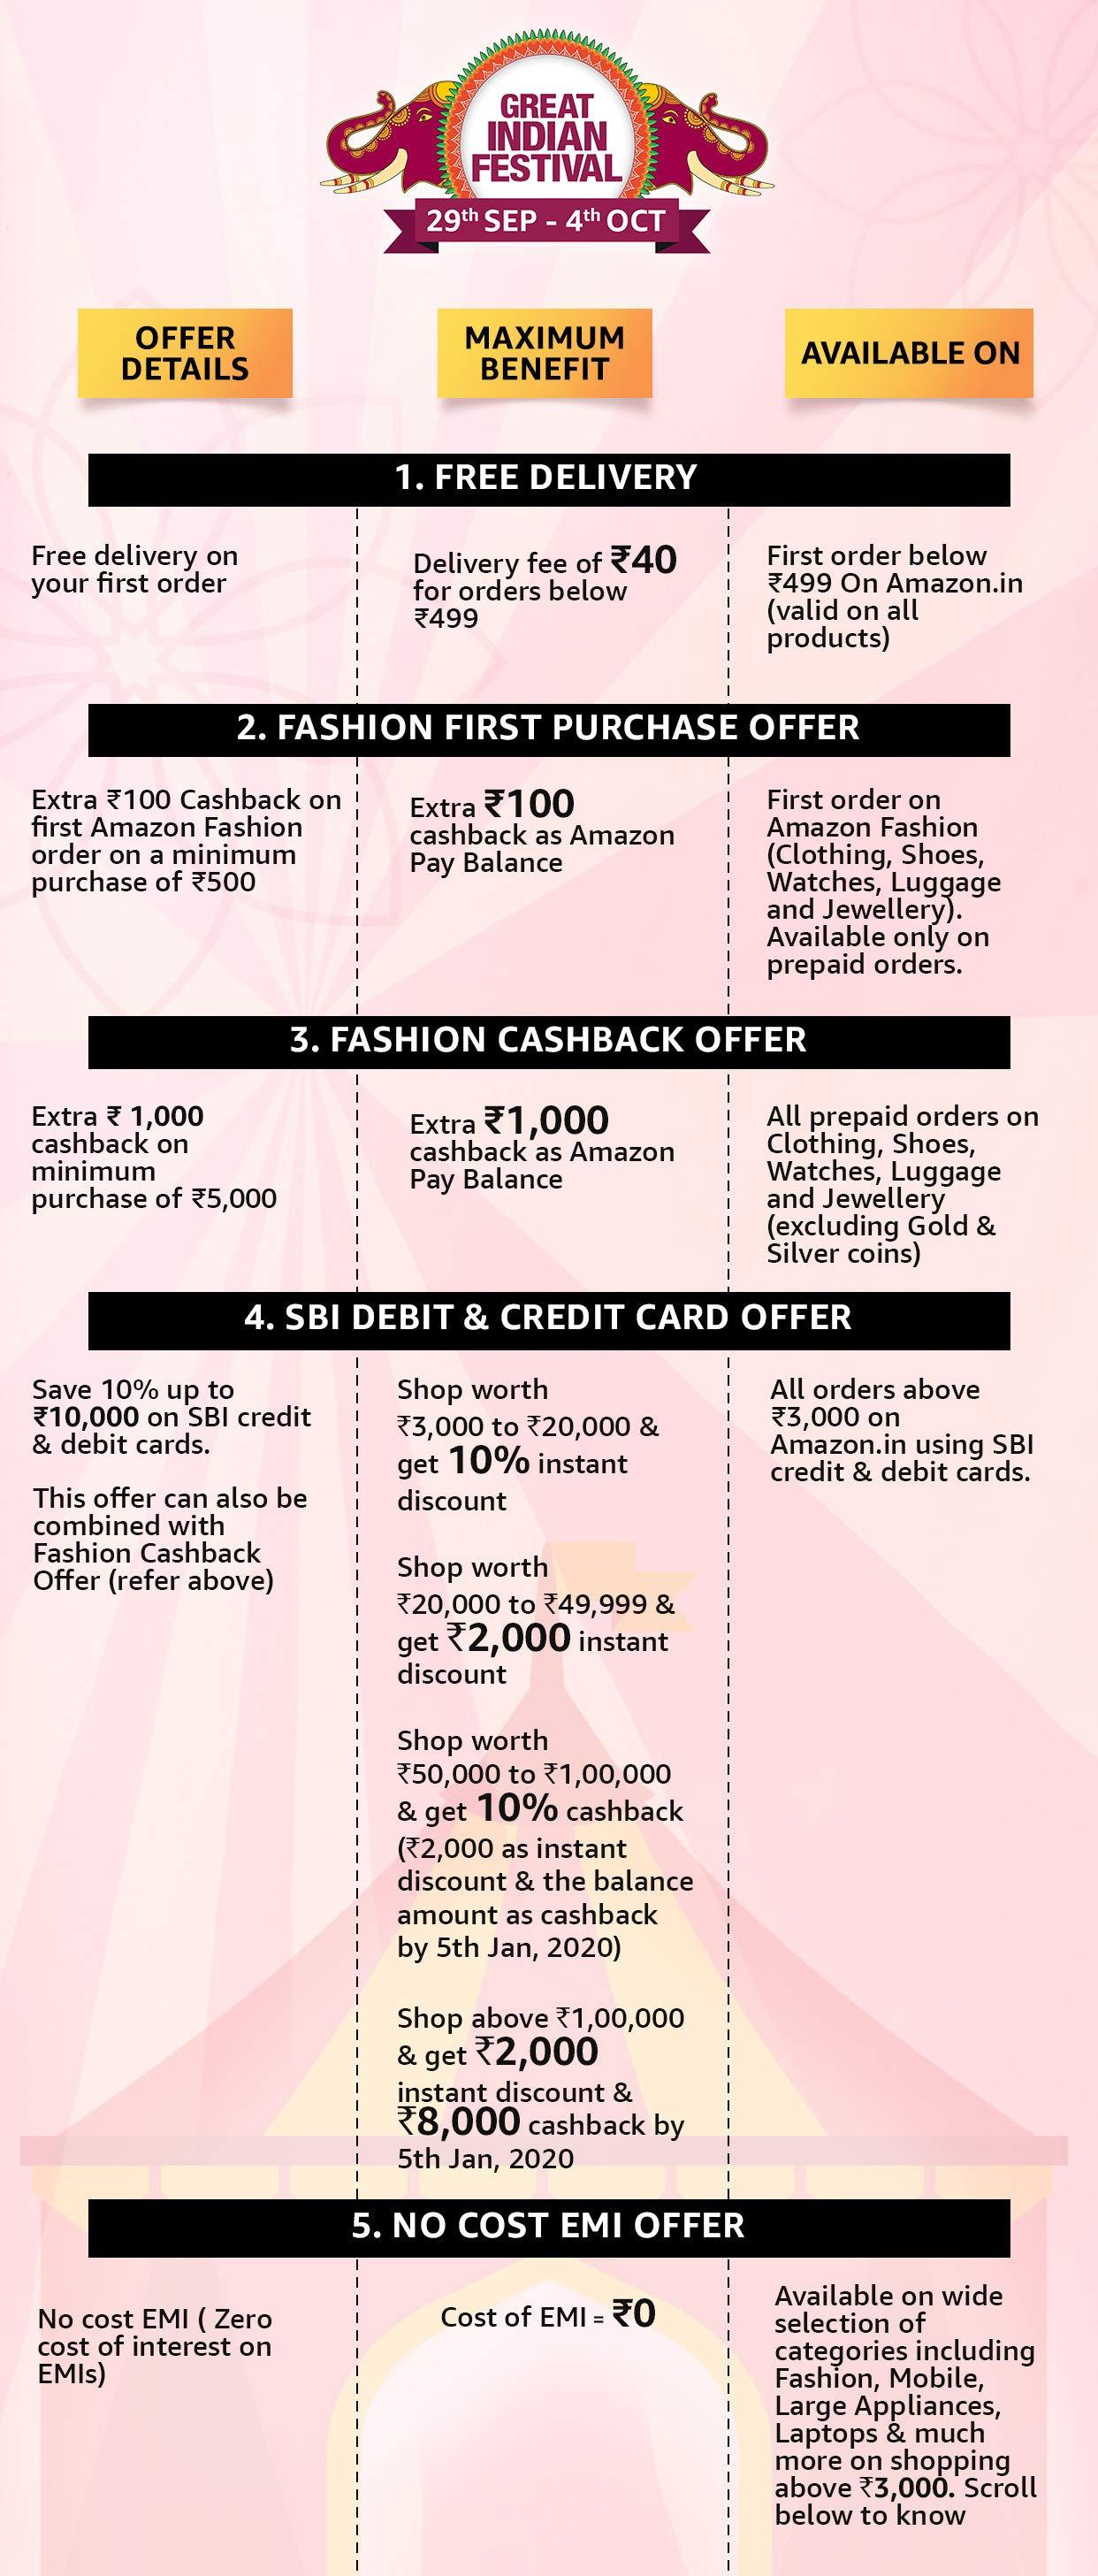 Cashback offers